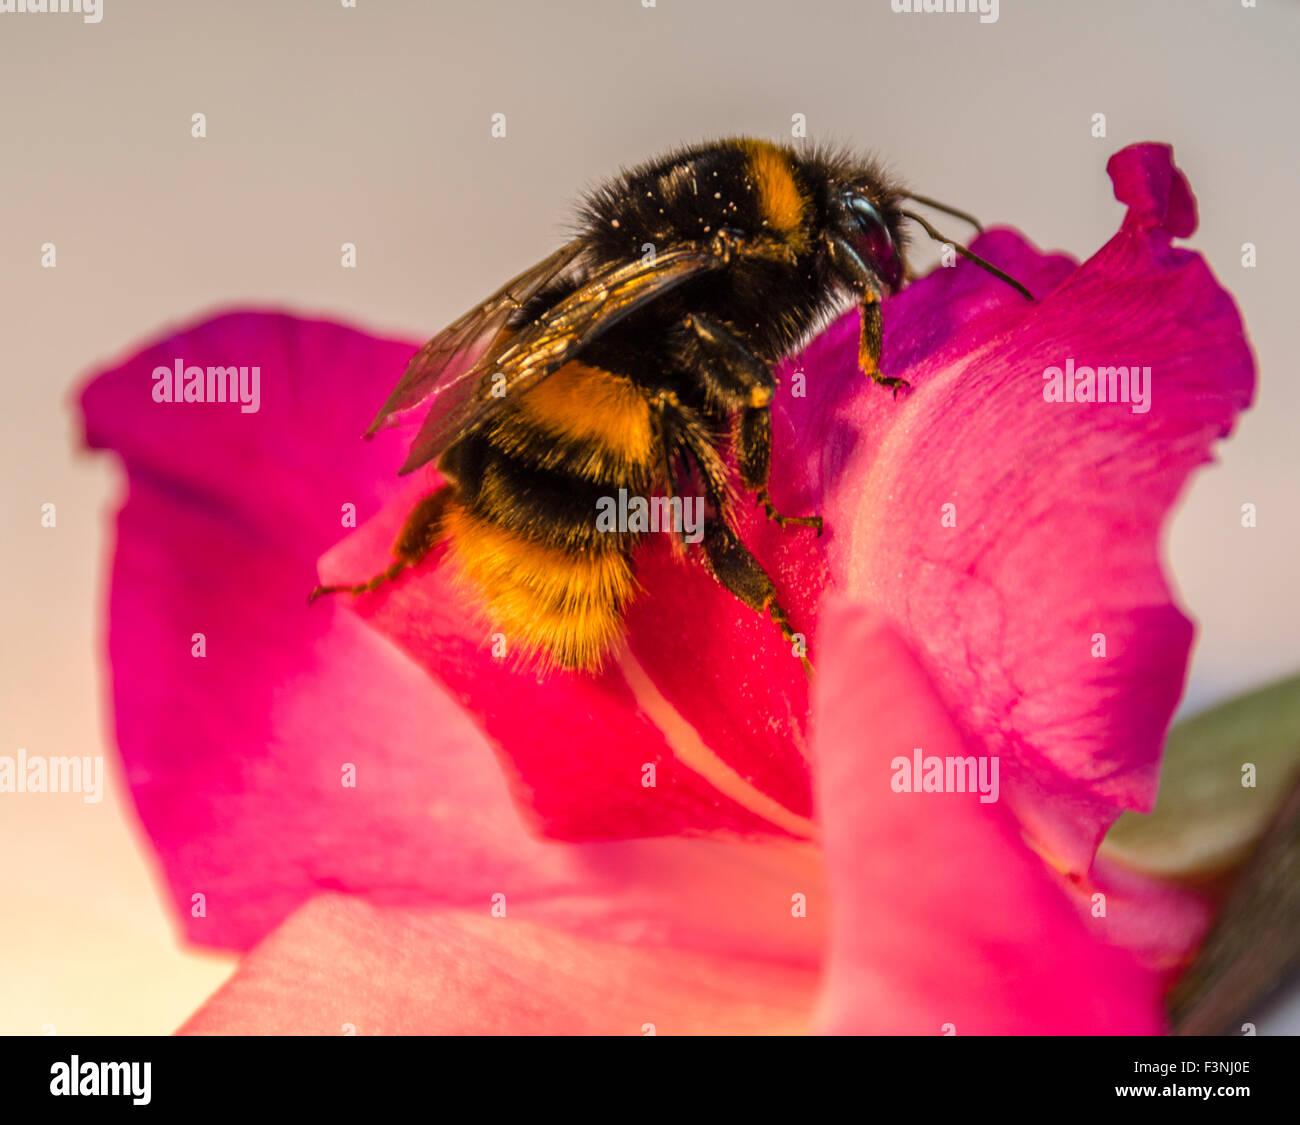 Macro close up of bee on pink petunia flower - Stock Image